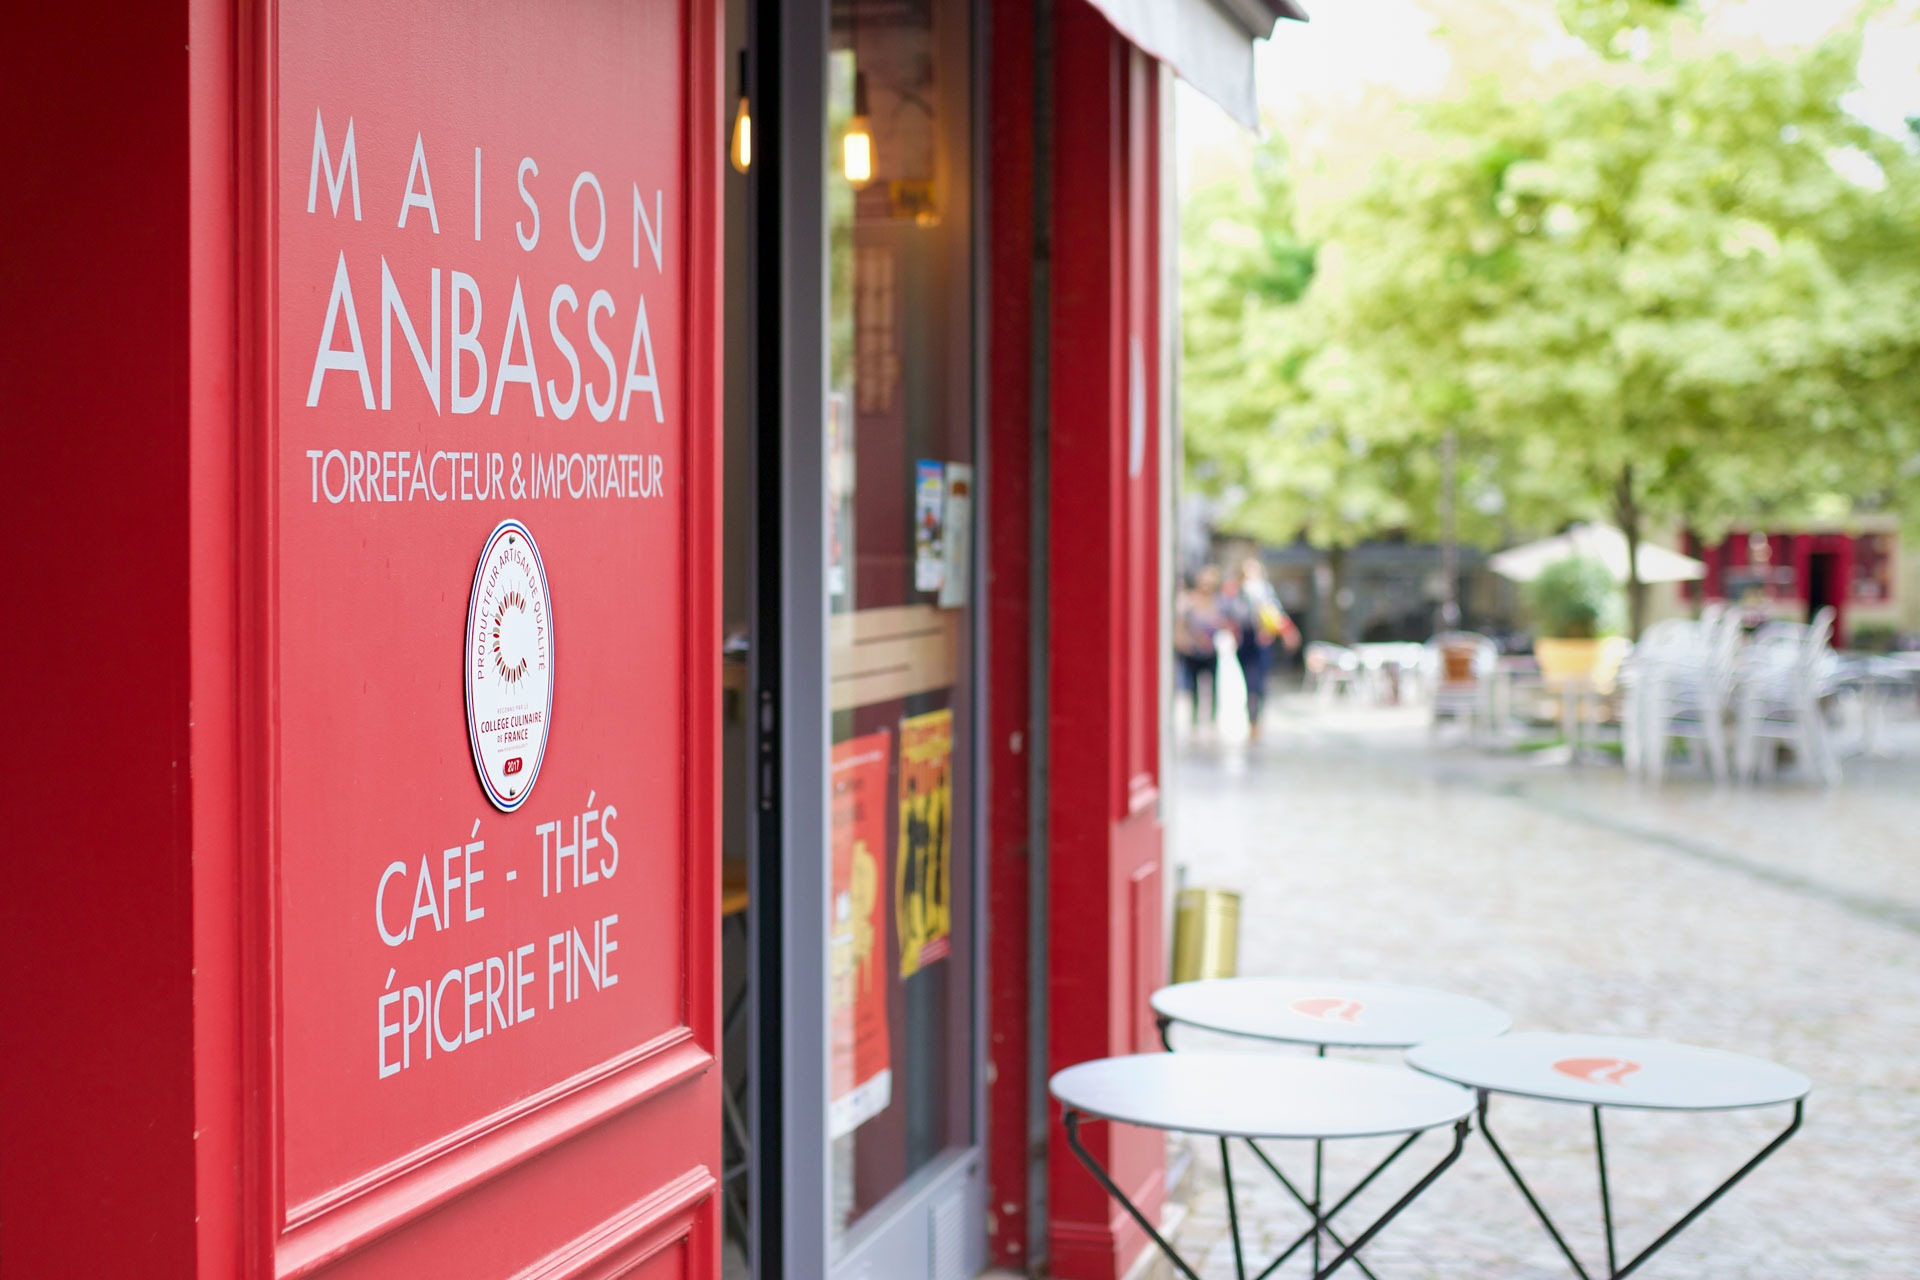 Anbassa-artisan-torrefacteur-notre histoire fond ecran